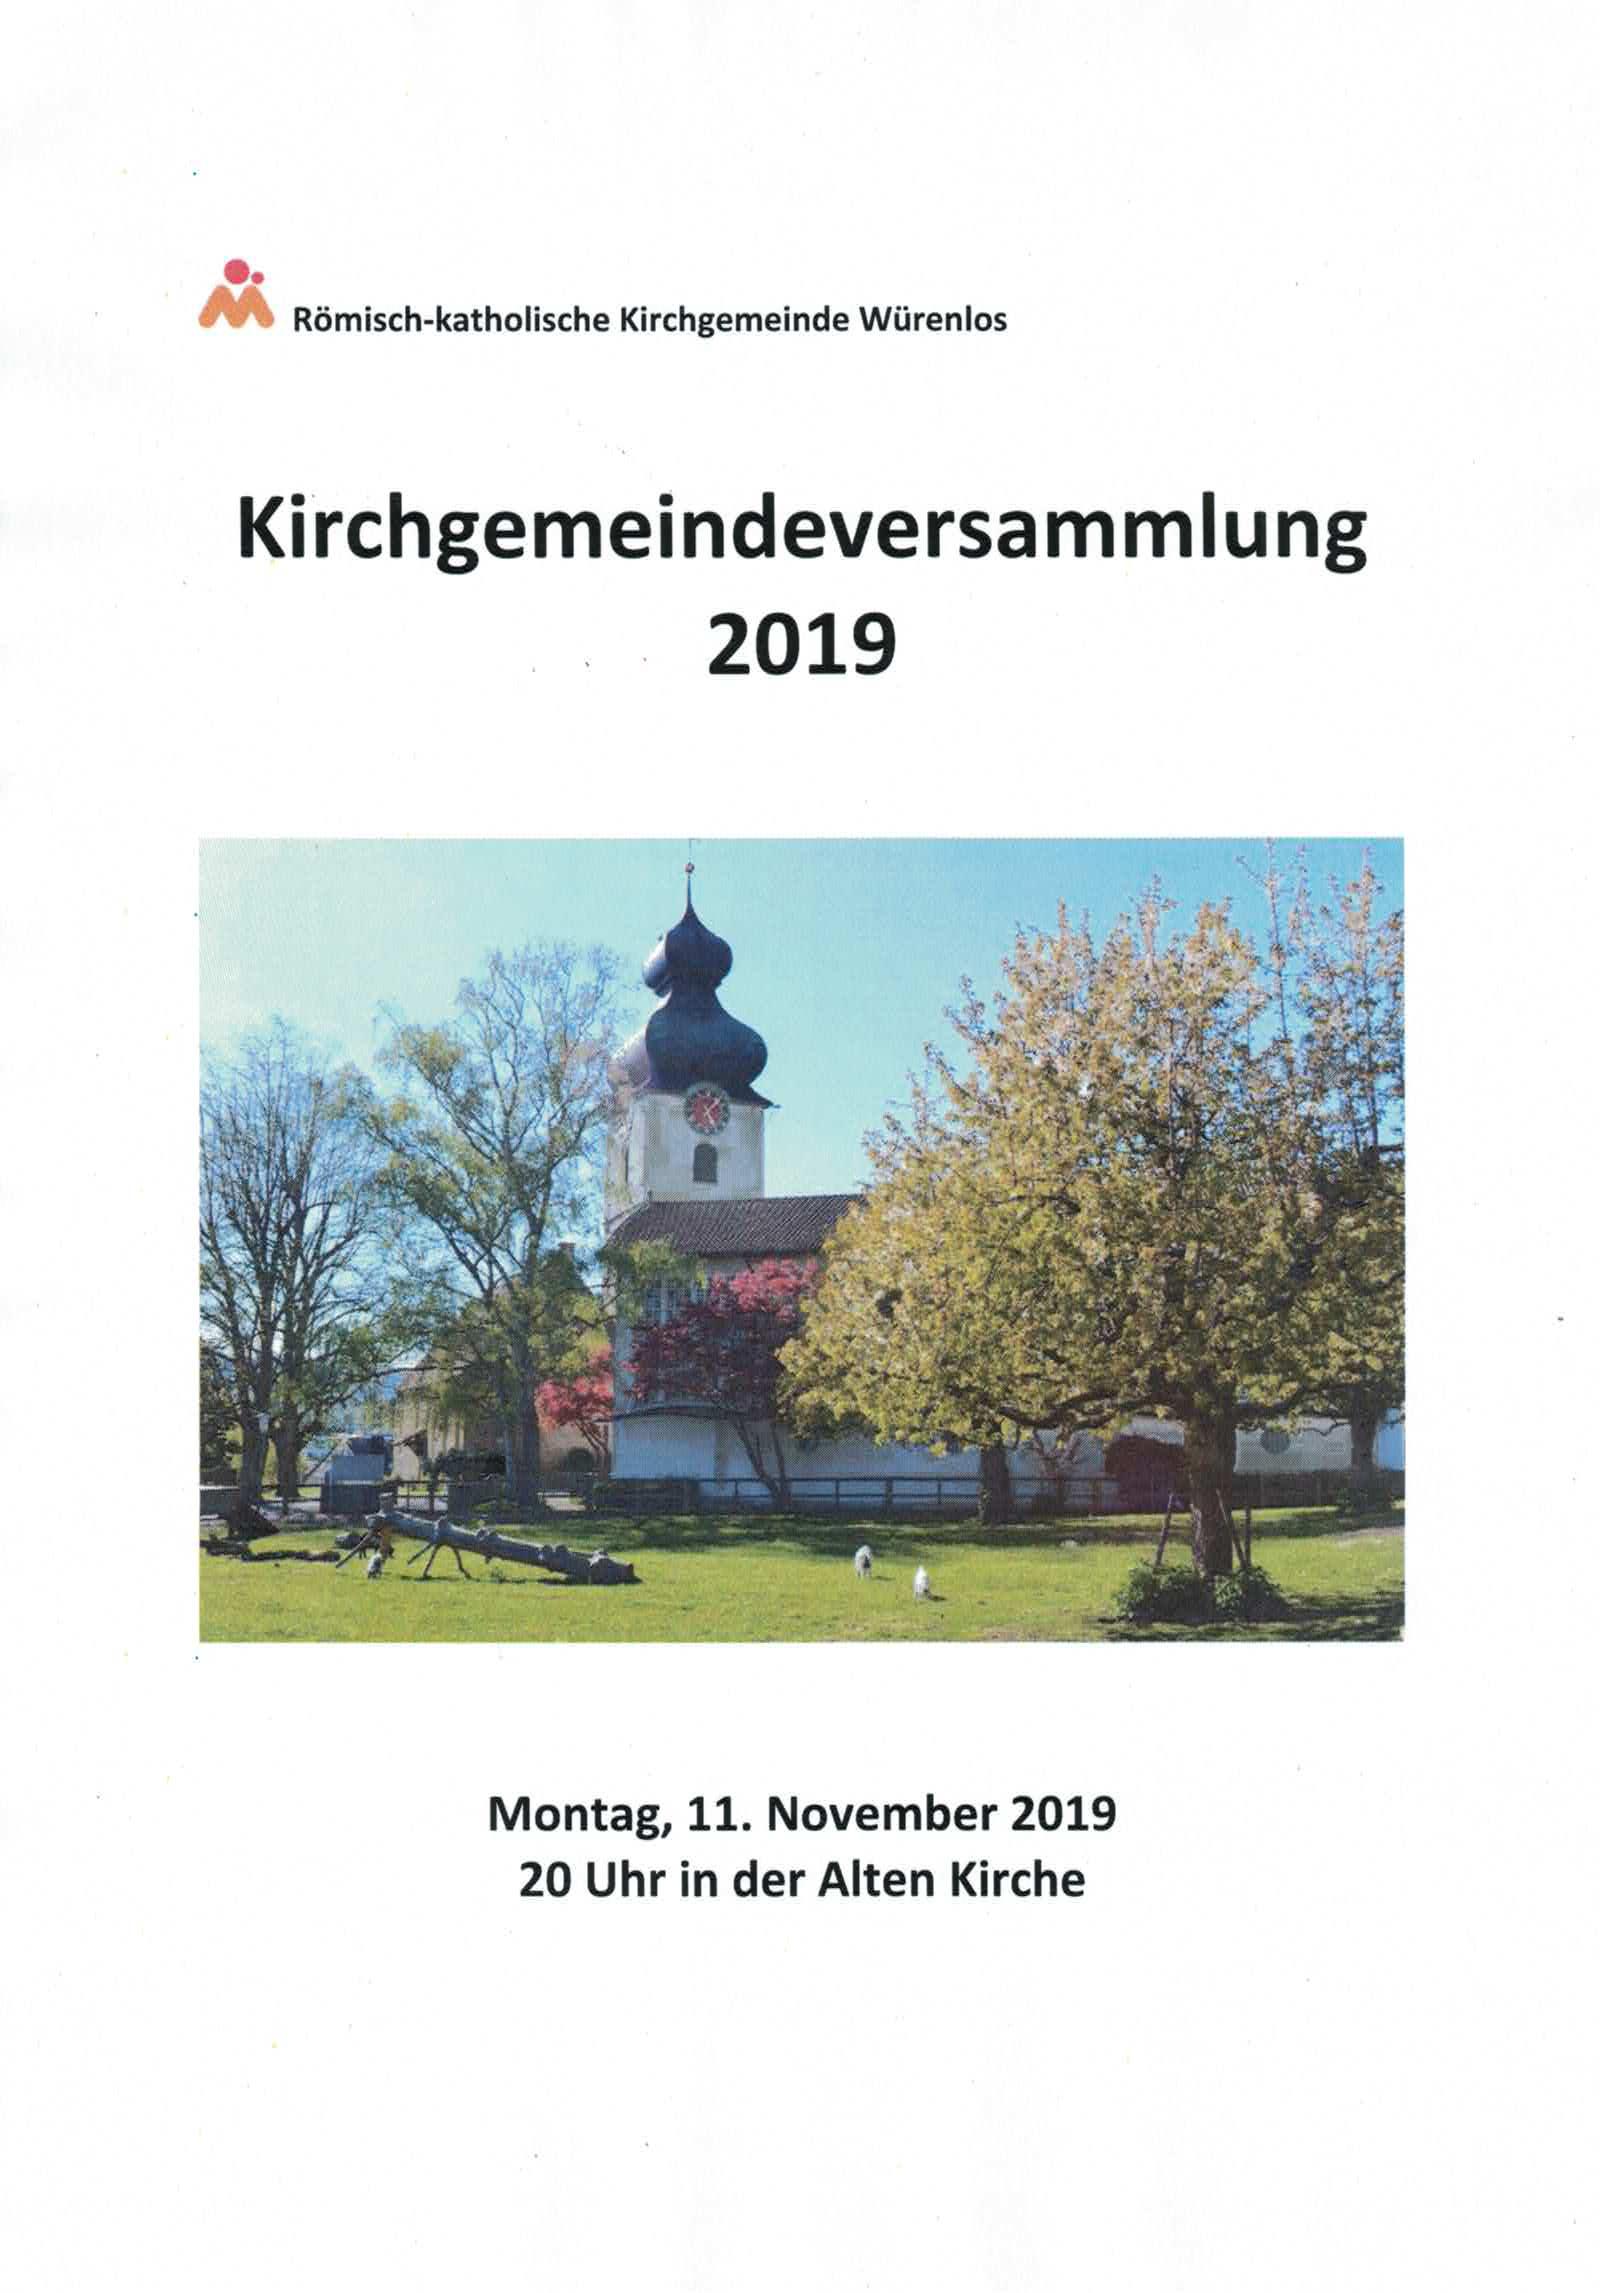 Kirchgemeindeversammlung 2019